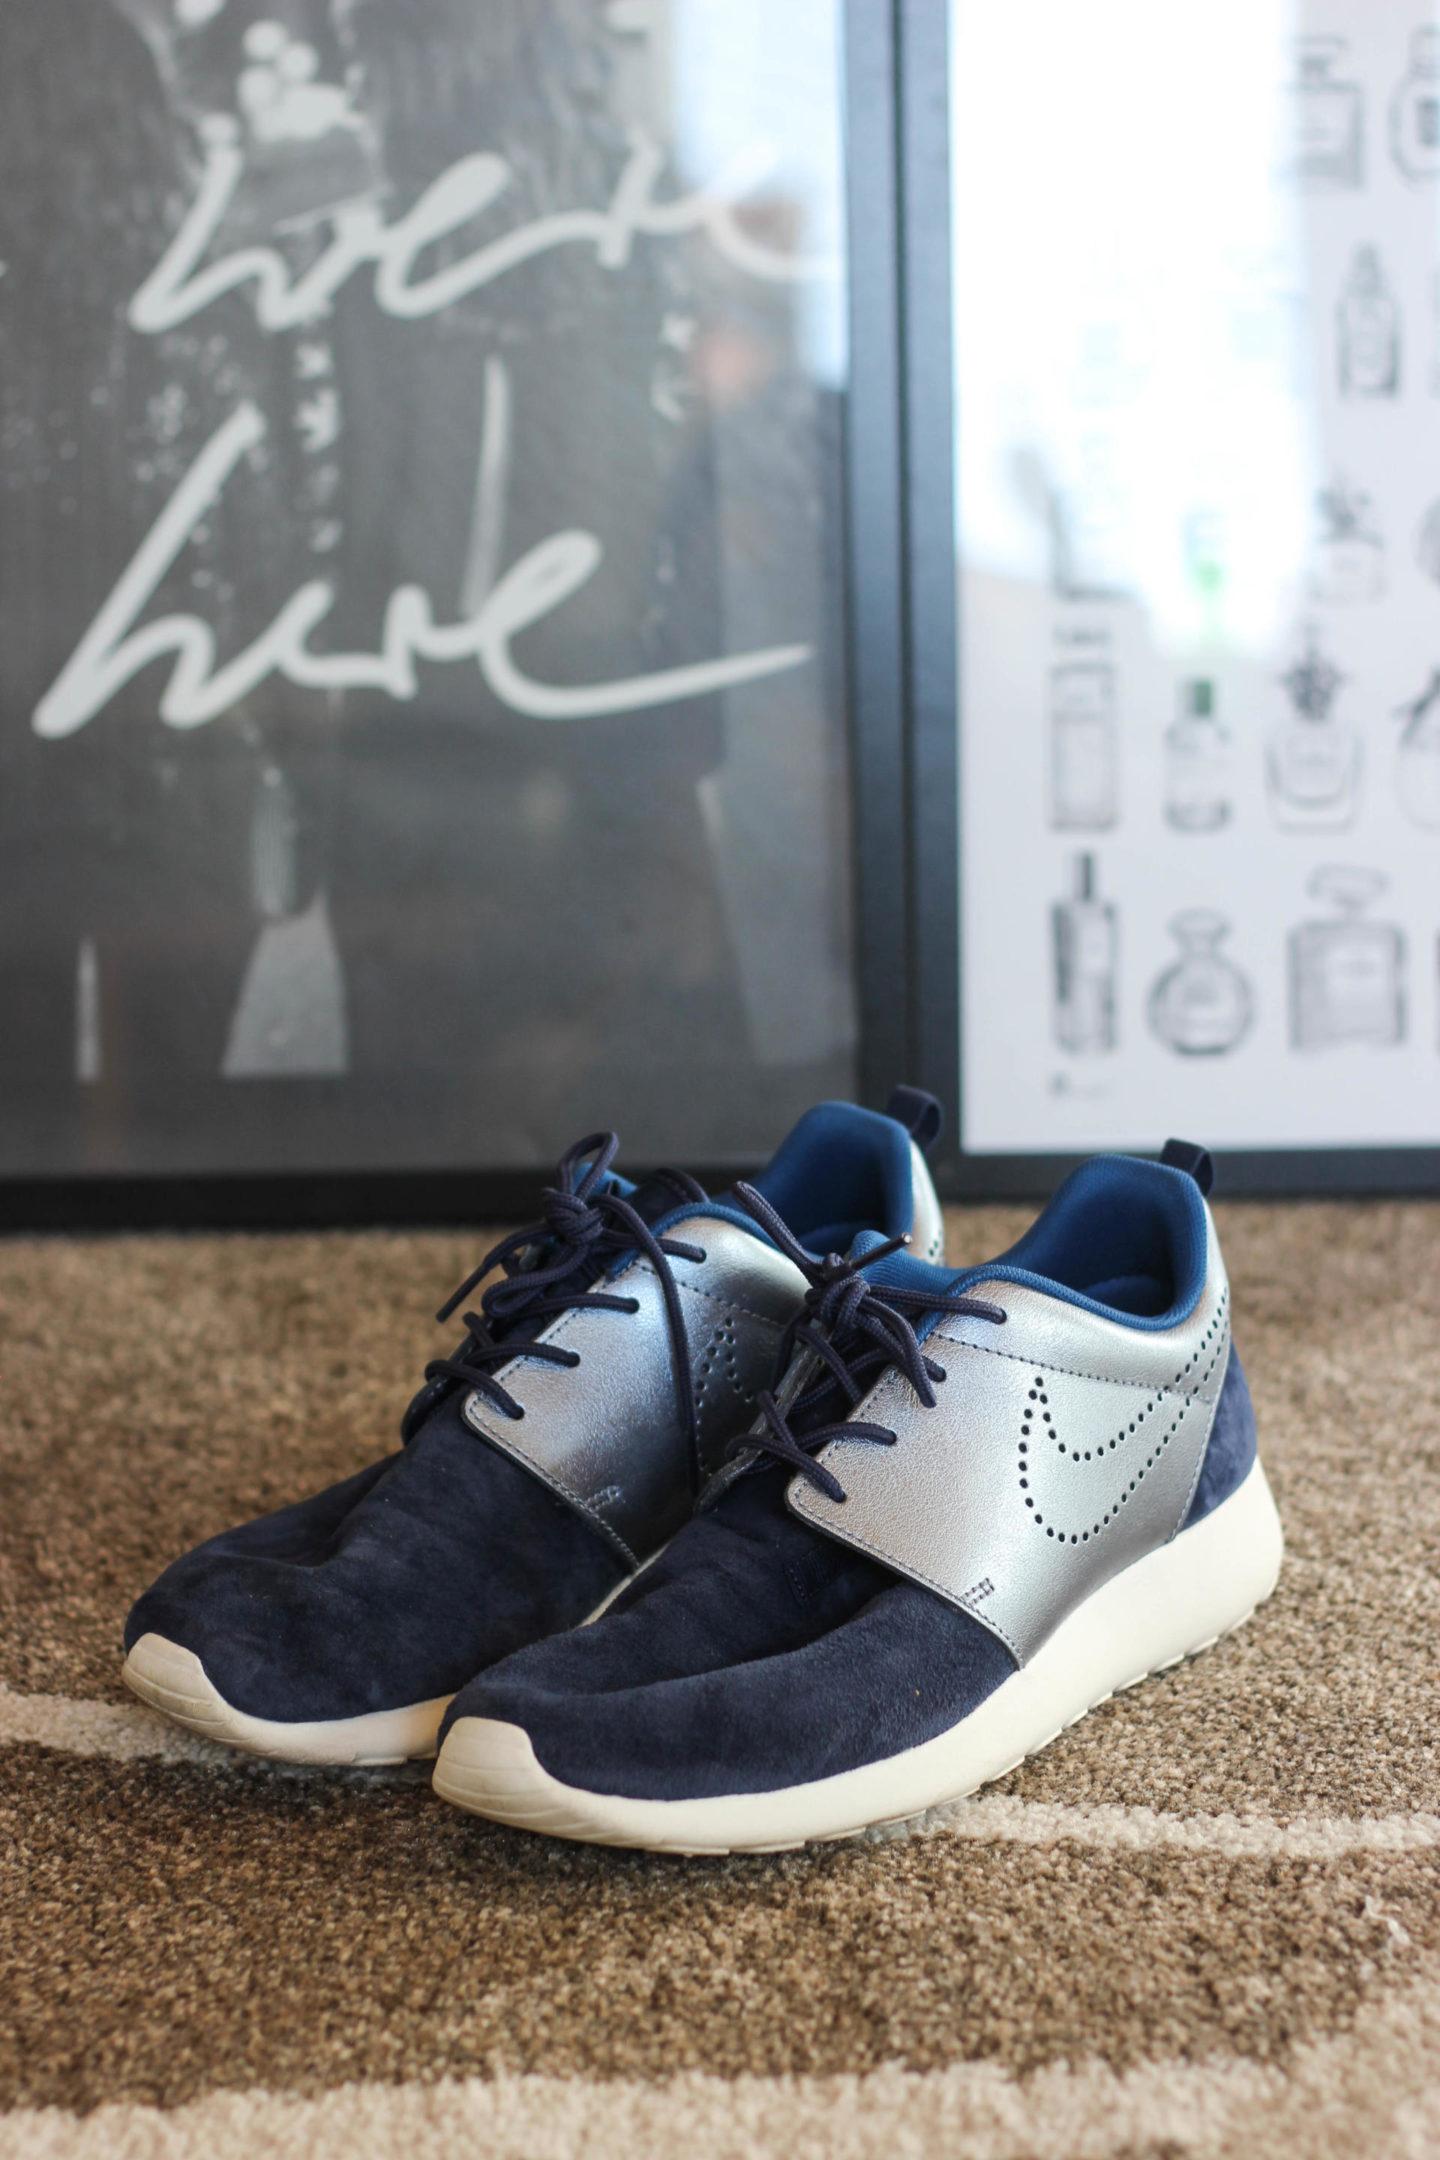 Nike Roshe One Premium Suede